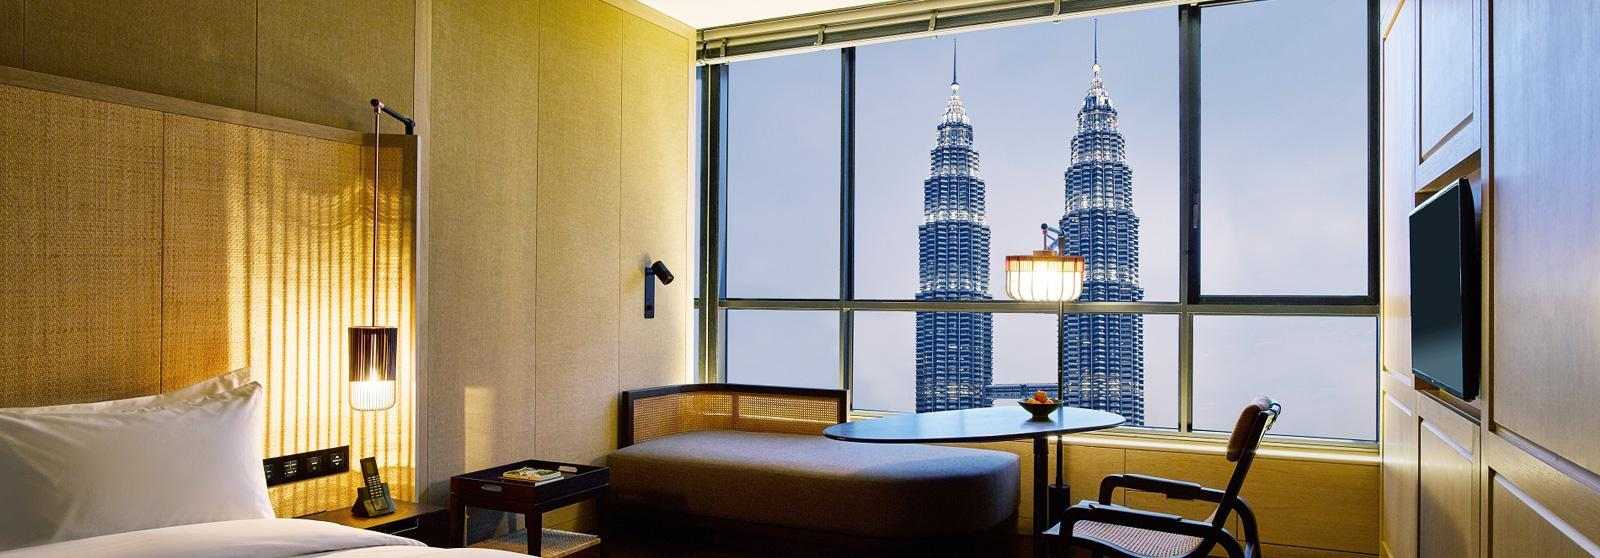 如瑪酒店及服務式公寓(The RuMa Hotel and Residences)【 吉隆坡,馬來西亞】 酒店  www.yisecj.live